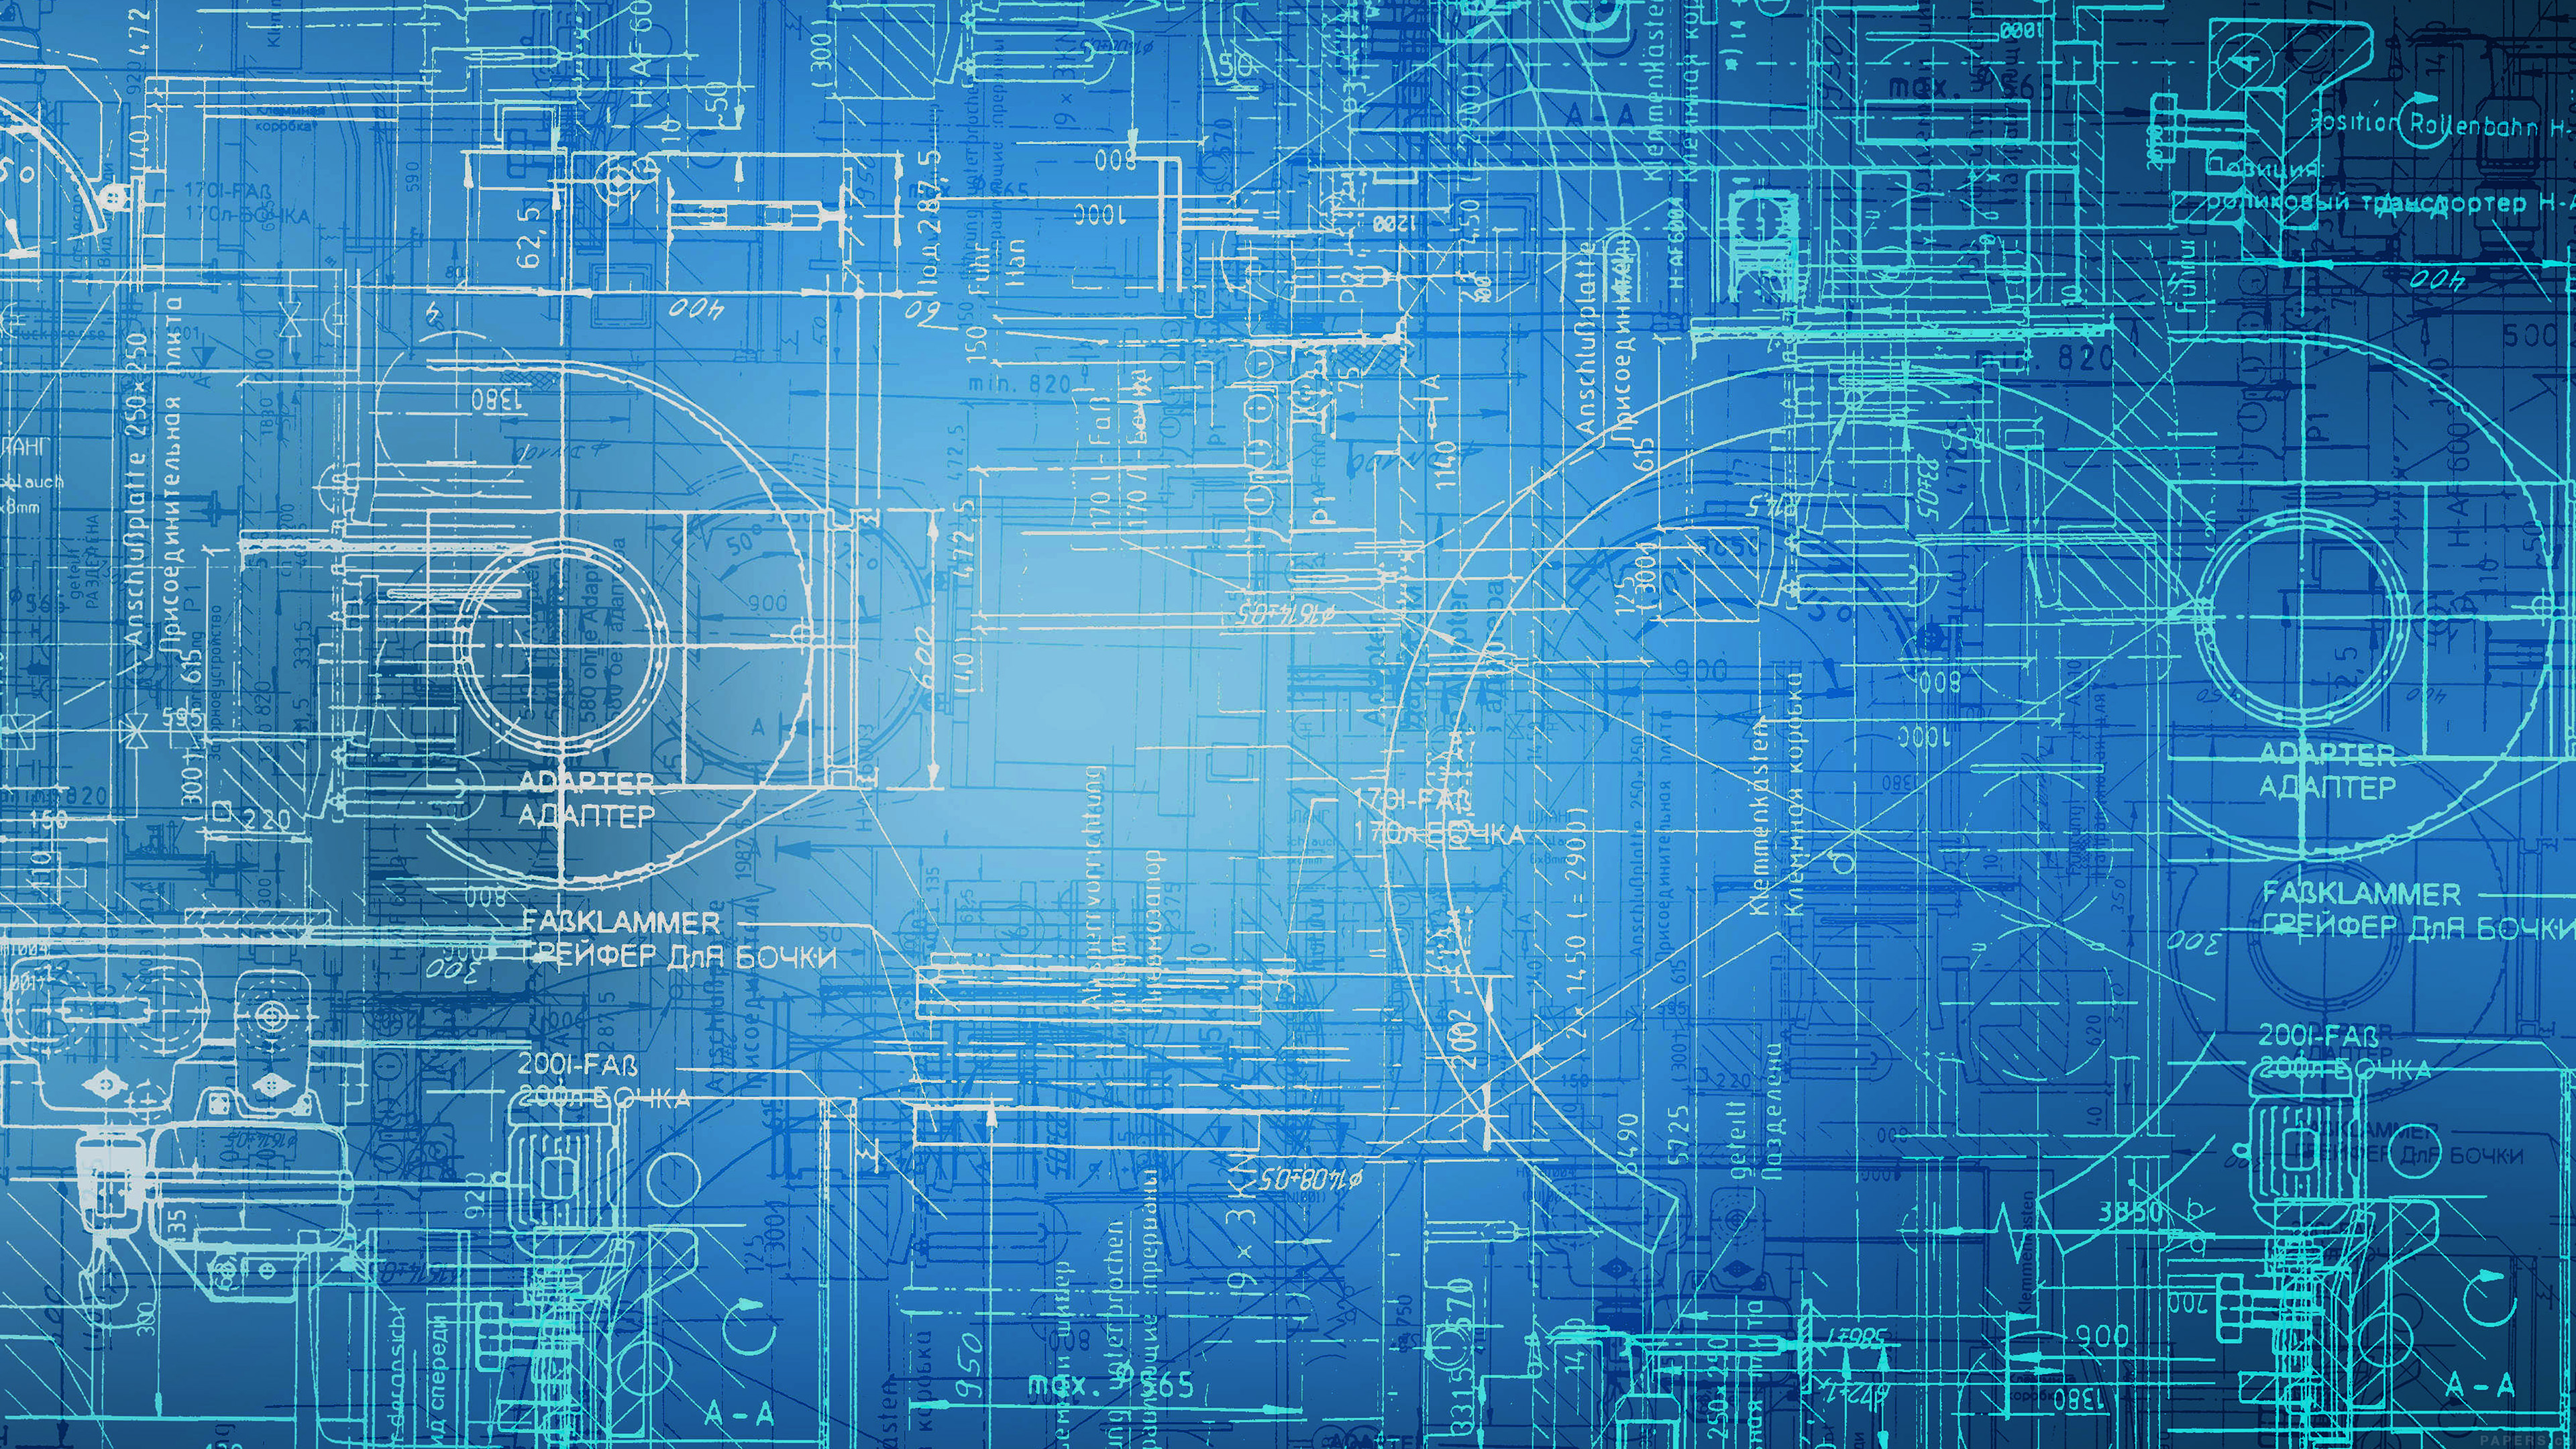 Luxury Car Pictures Wallpaper Wallpaper For Desktop Laptop Vi77 Brainstorming